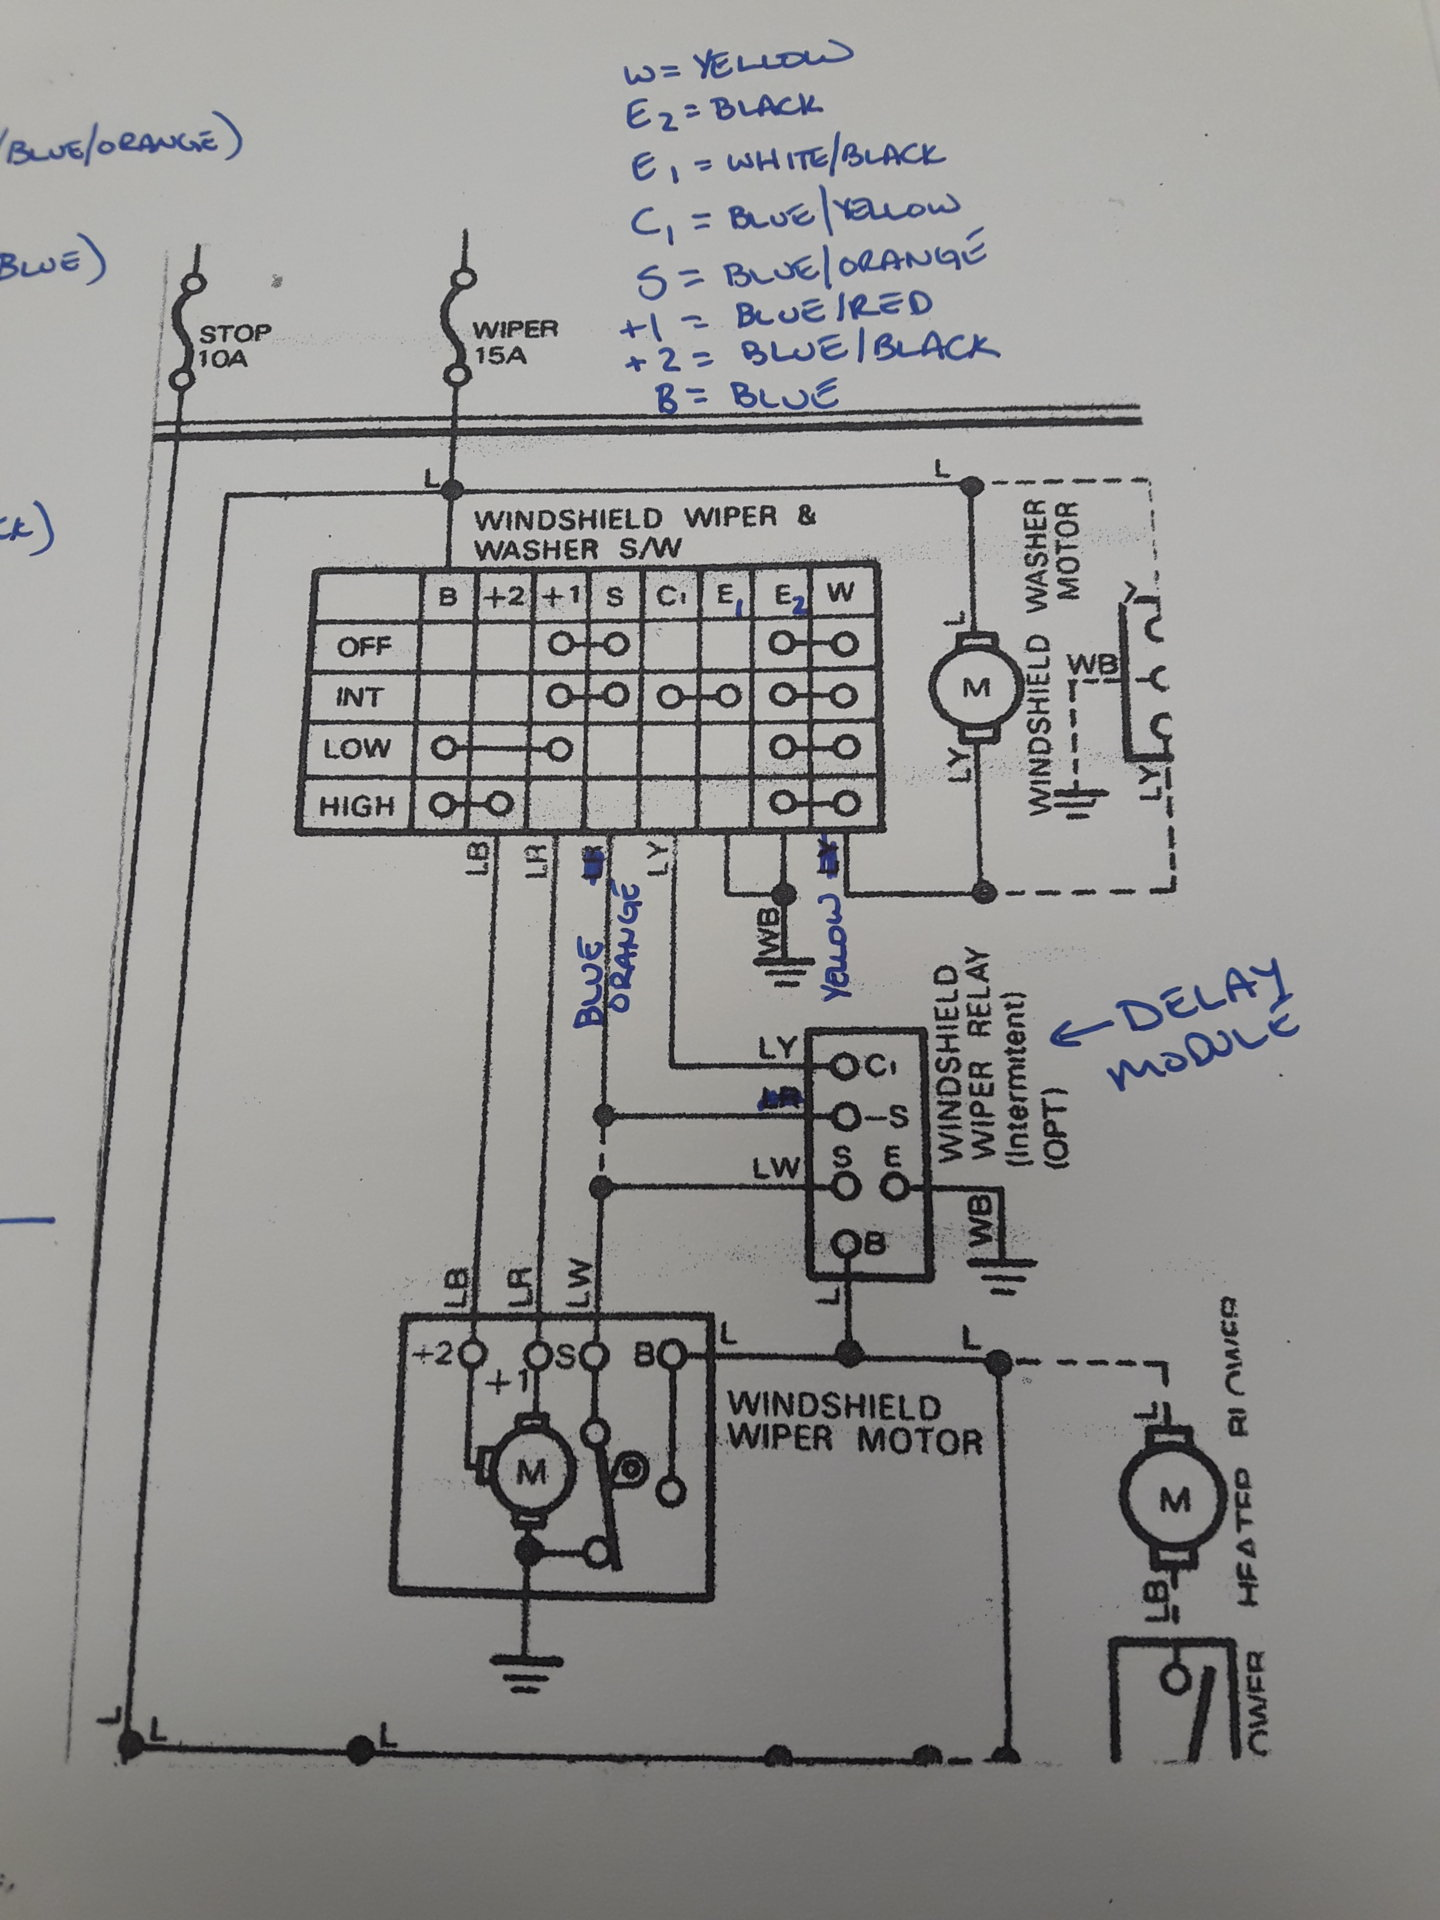 fj40 wiper motor wiring diagram wiring library Tail Light Wiring Diagram 20180915_163554 jpg wiring wiper